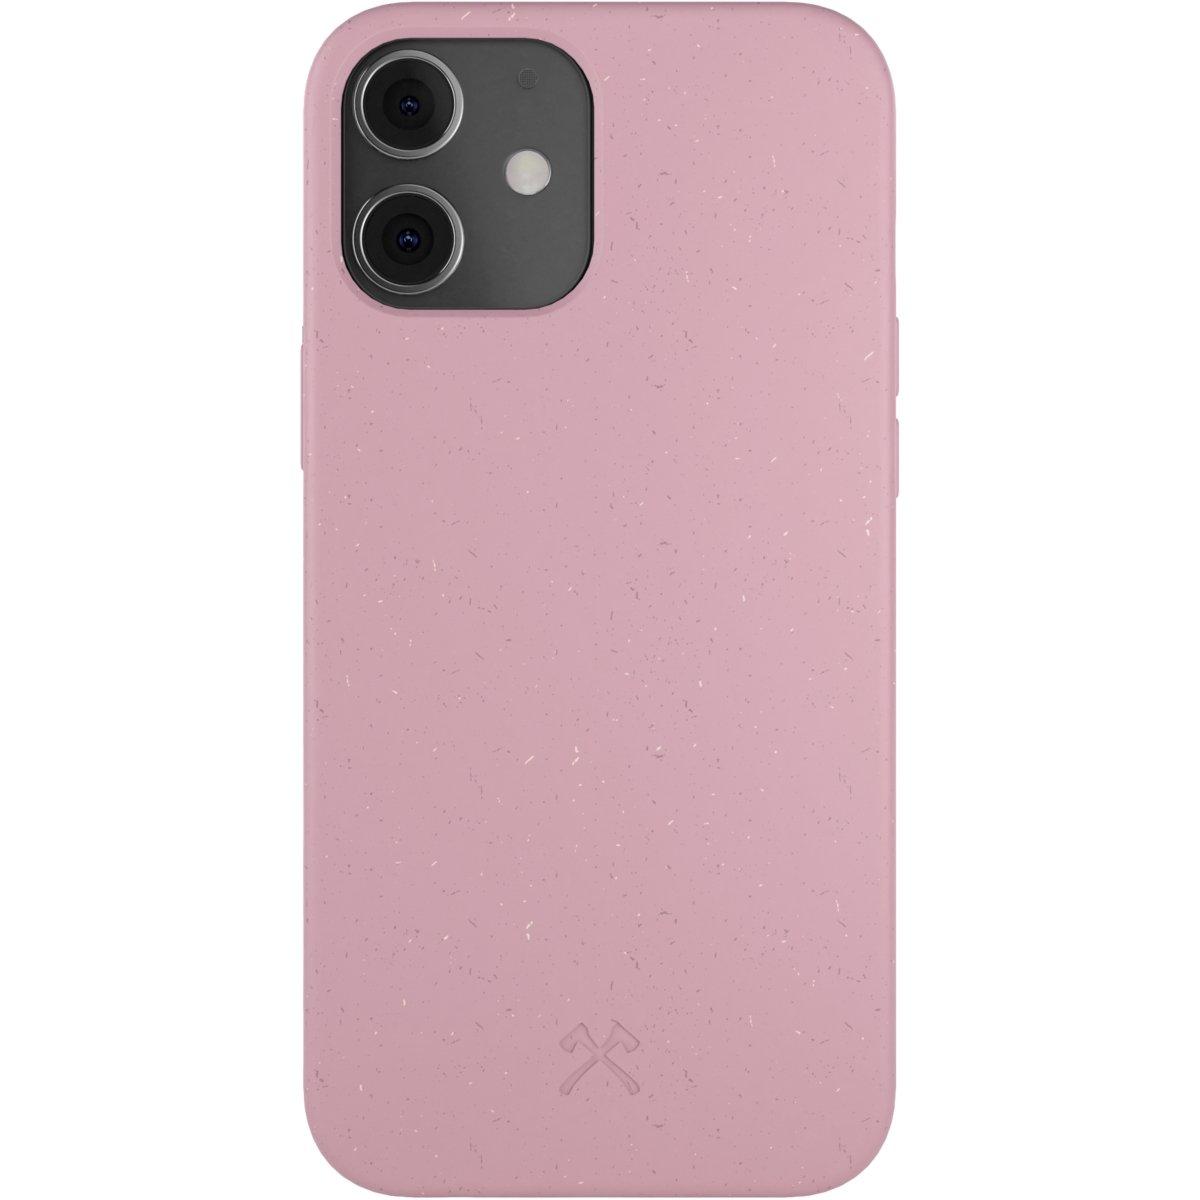 Woodcessories Bio Case AM iPhone 12 Mini - pink